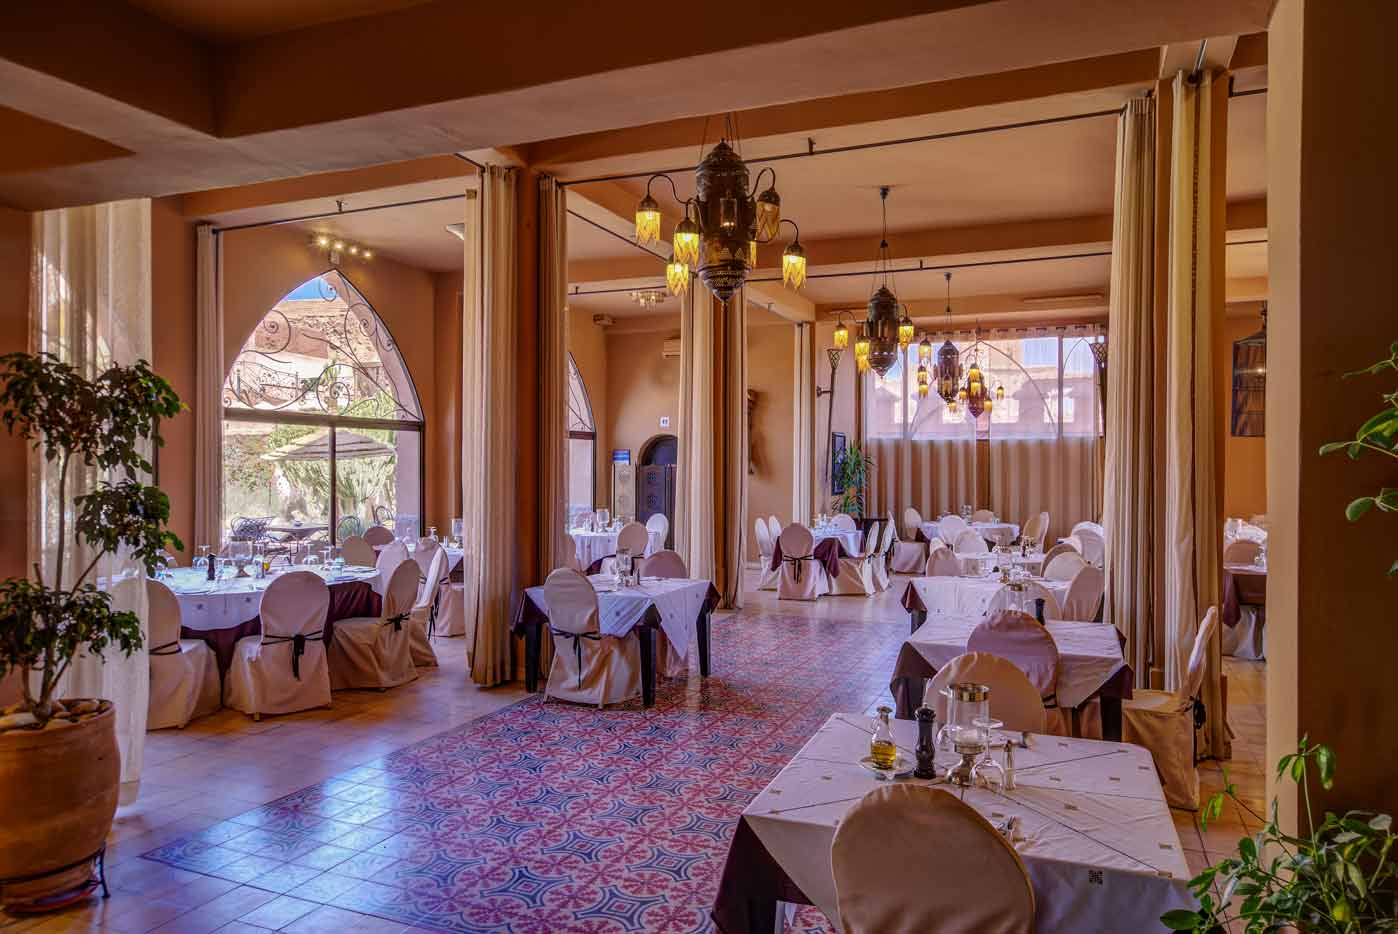 Restaurant - Ksar Ighnda Ouarzazate Maroc